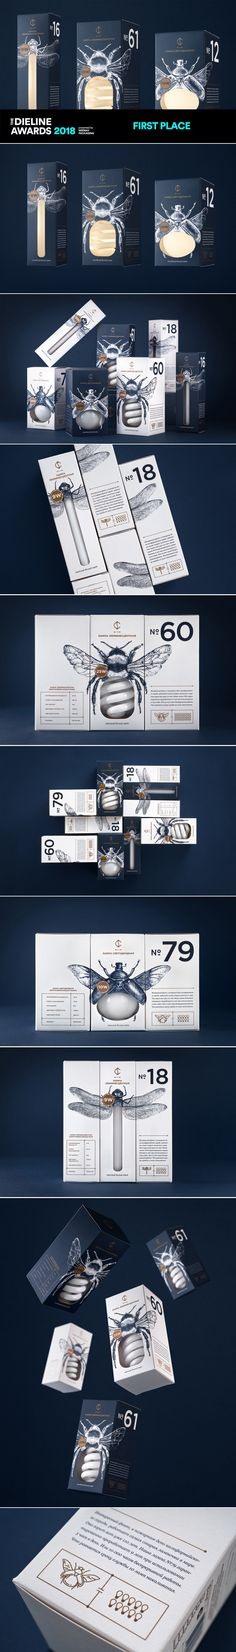 40 Packaging Mock Up Design Ideas Packaging Packaging Inspiration Packaging Design